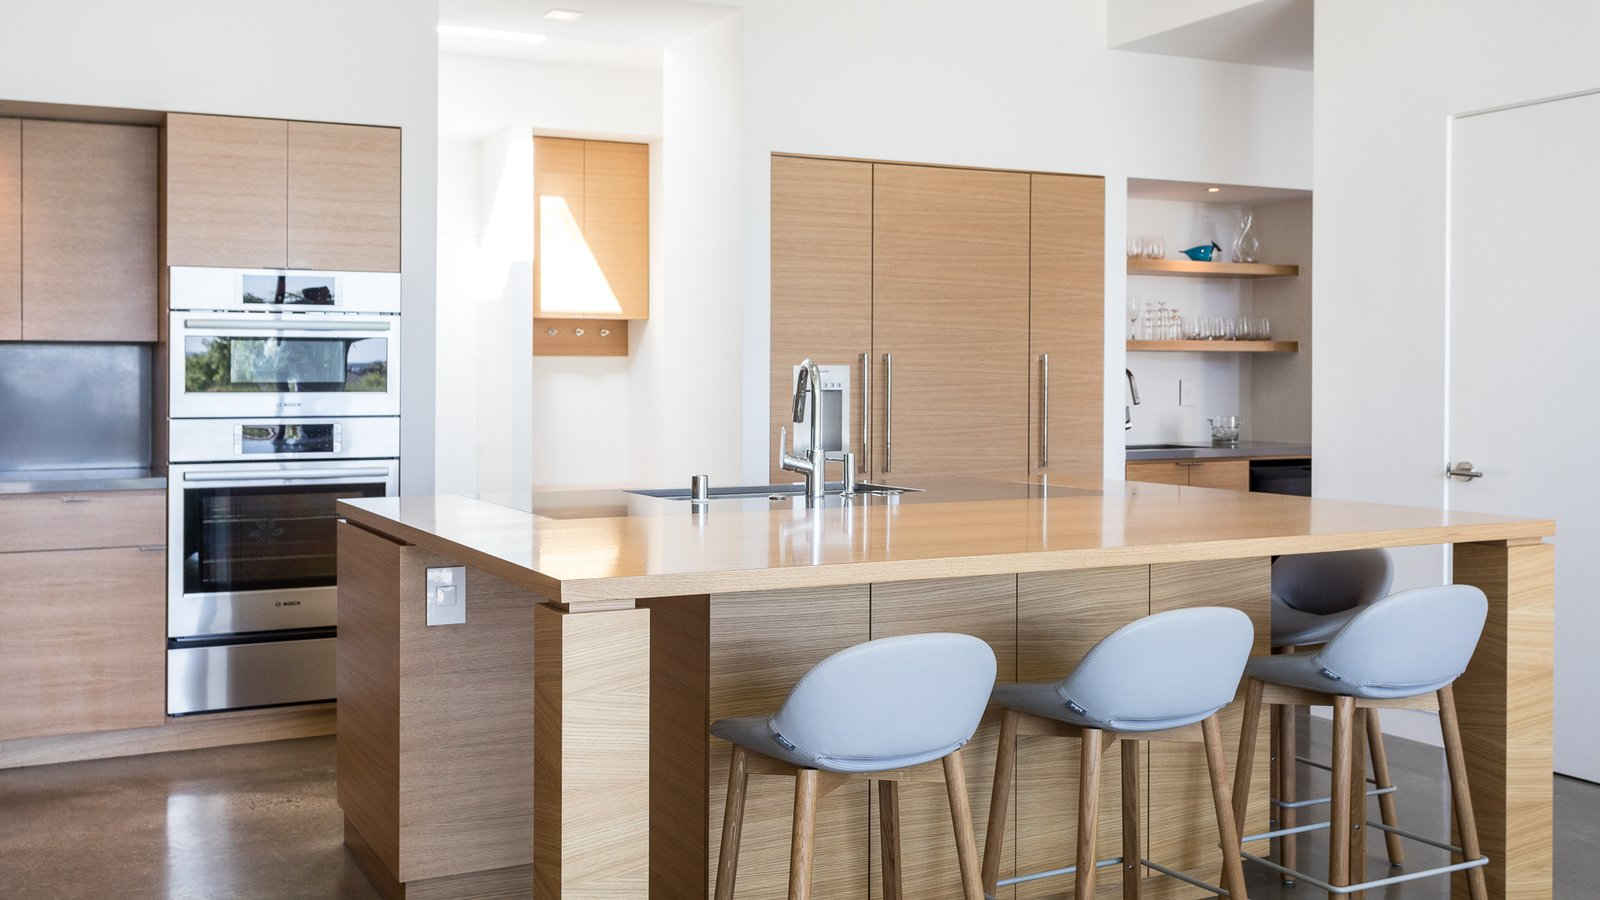 Kitchen, Concrete Floor, Wood Cabinet, Recessed Lighting, Engineered Quartz Counter, Undermount Sink, and Refrigerator  Best Photos from Folsom